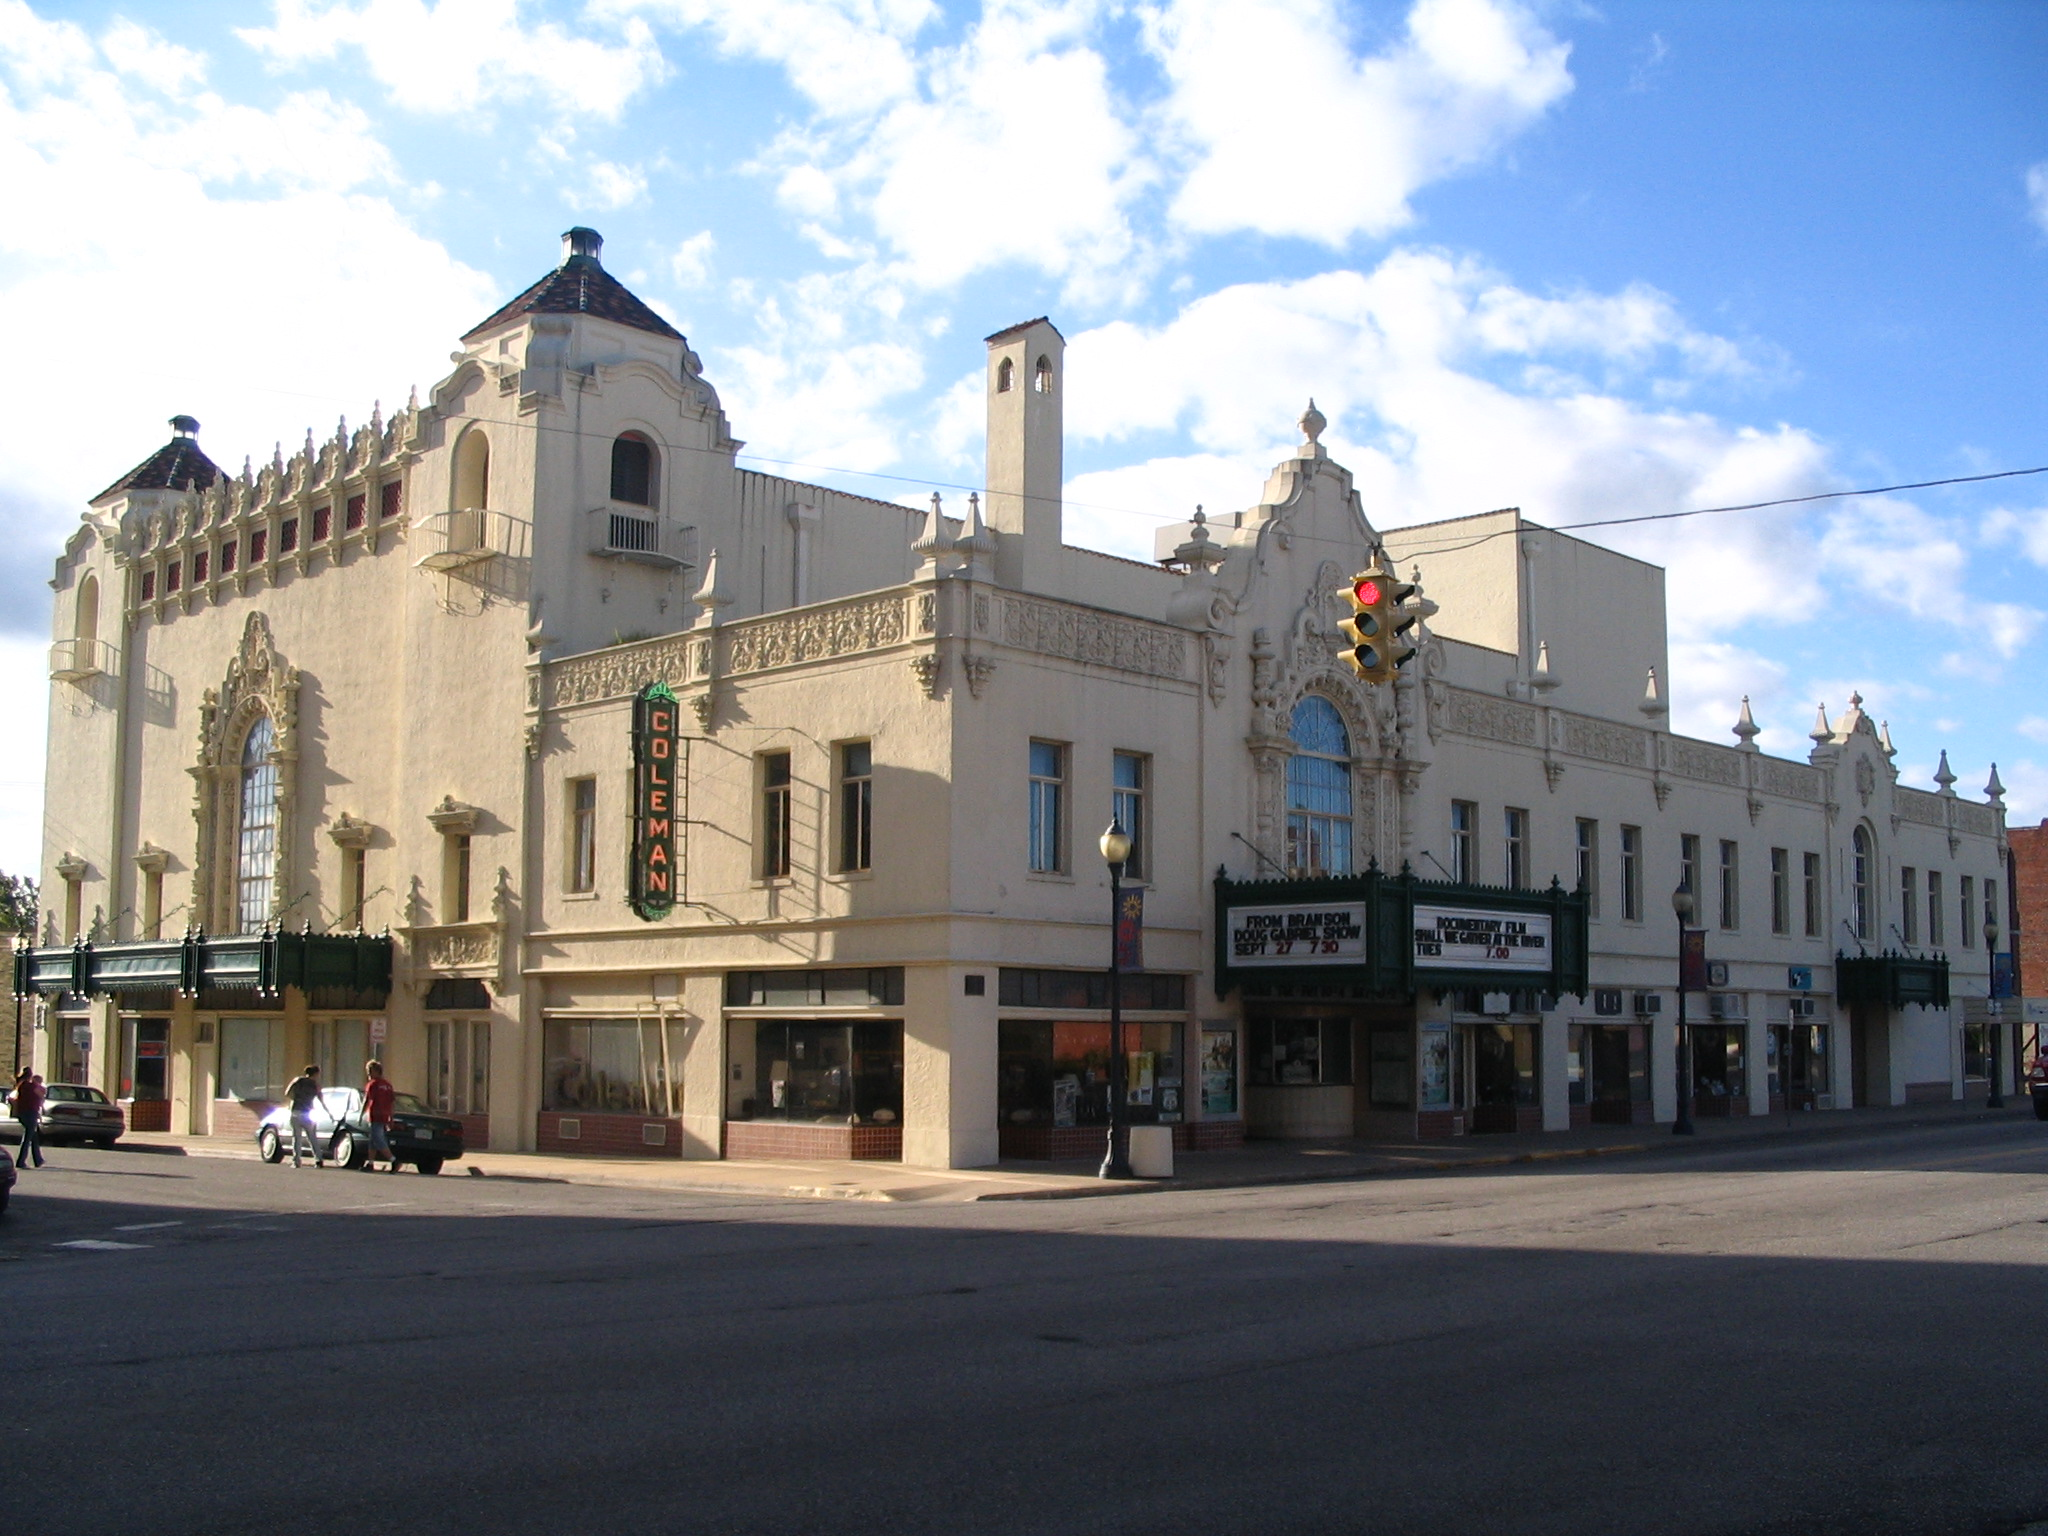 filecoleman theater in miami okjpg wikimedia commons